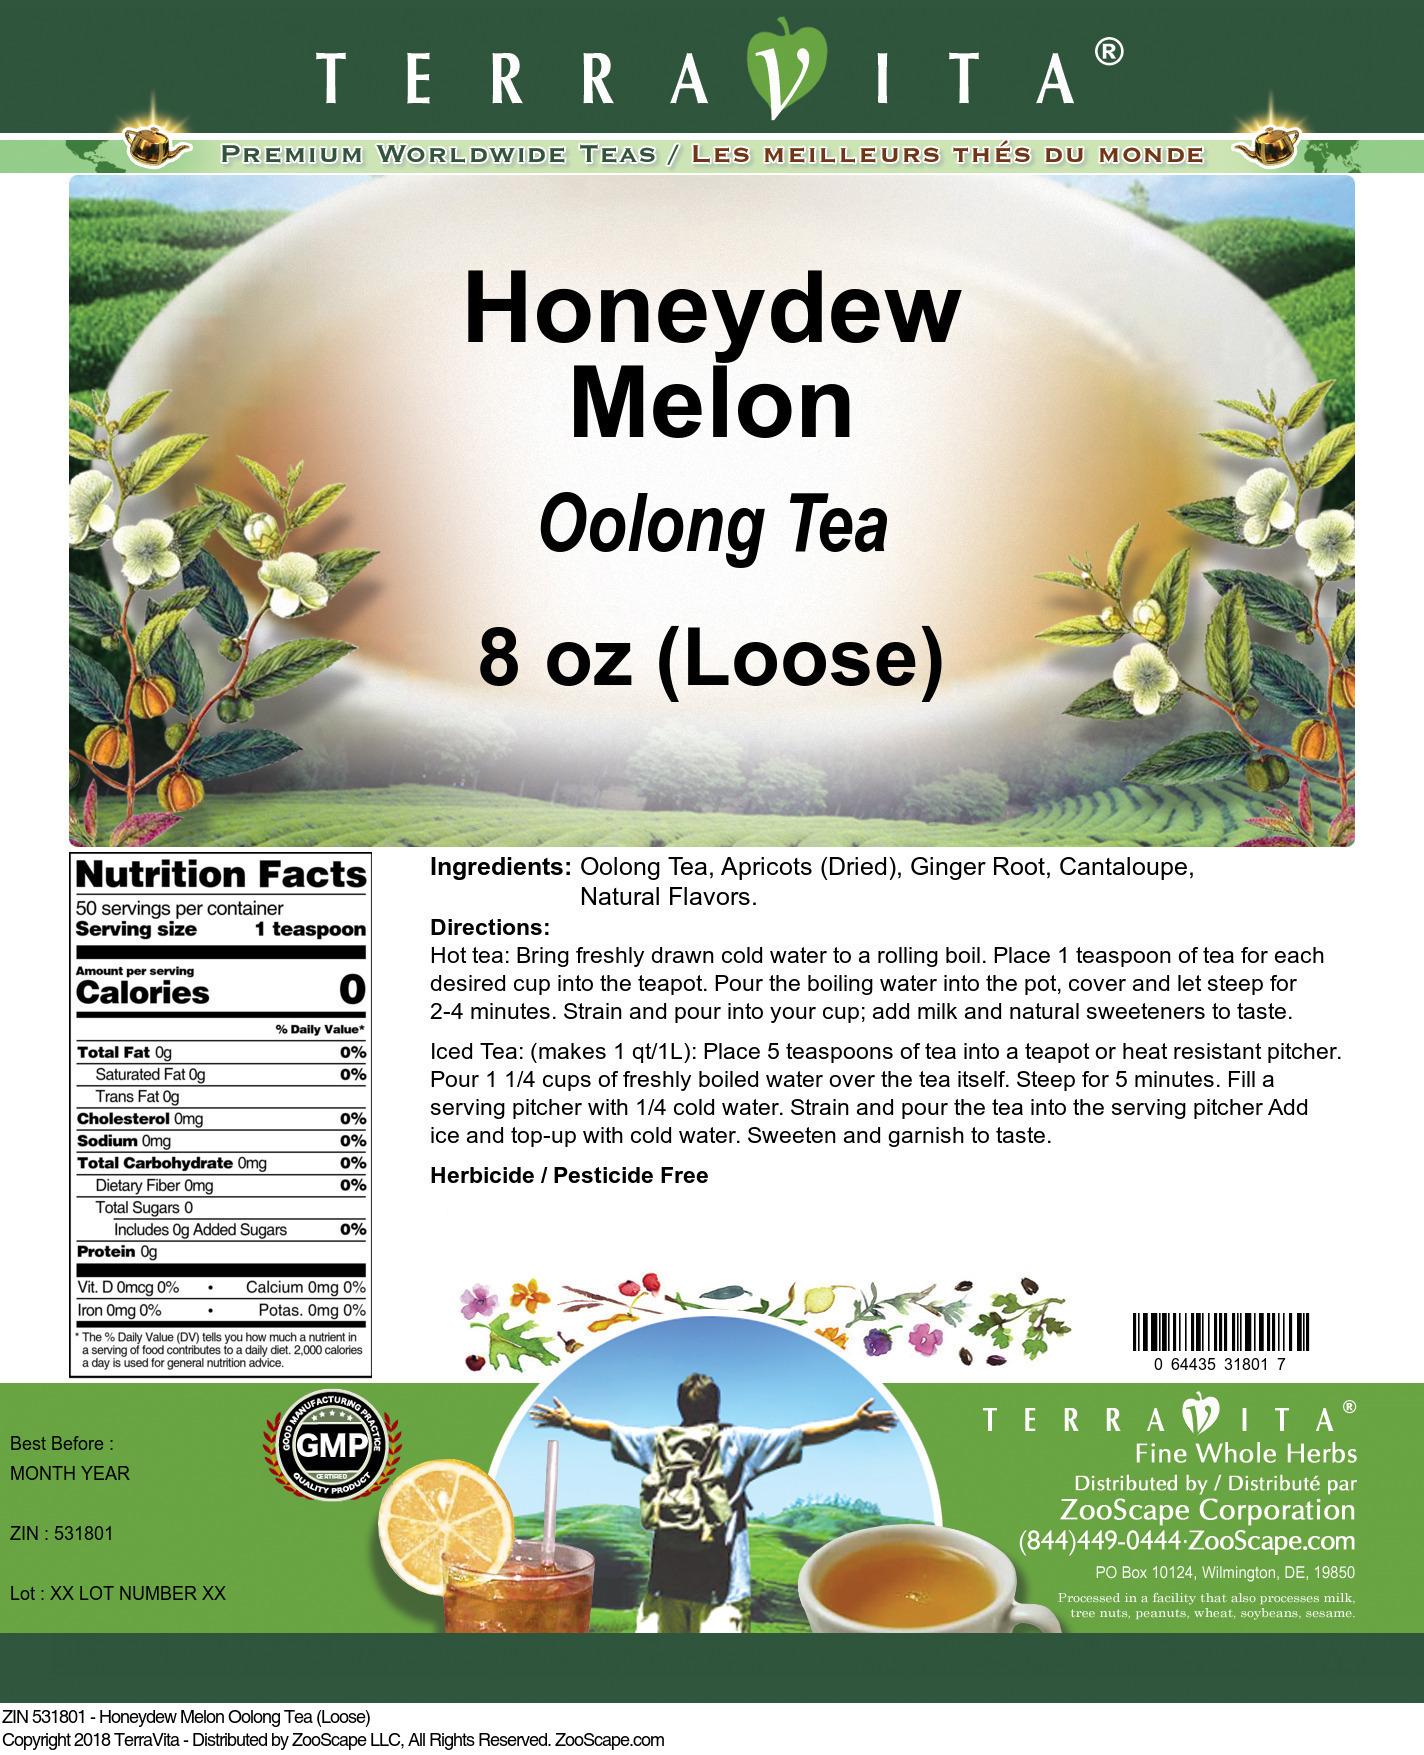 Honeydew Melon Oolong Tea (Loose)